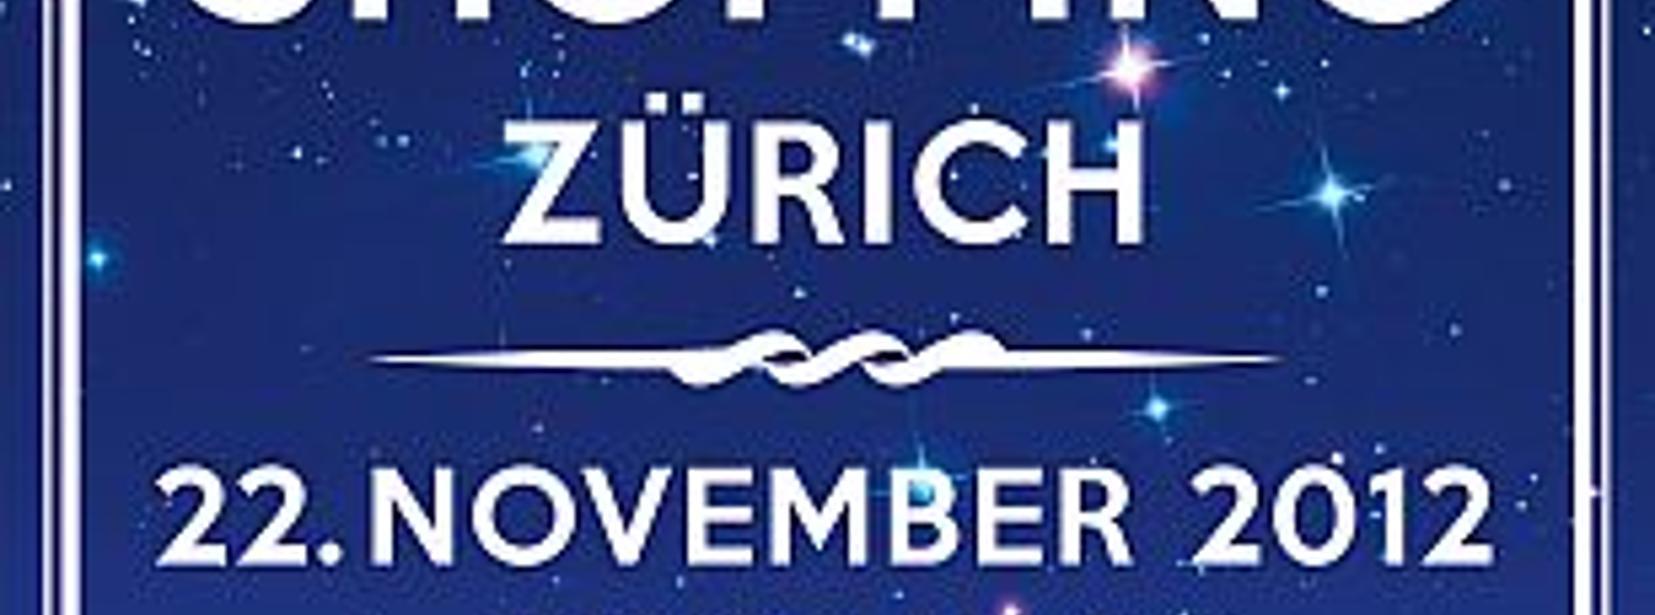 Zurich coupon book